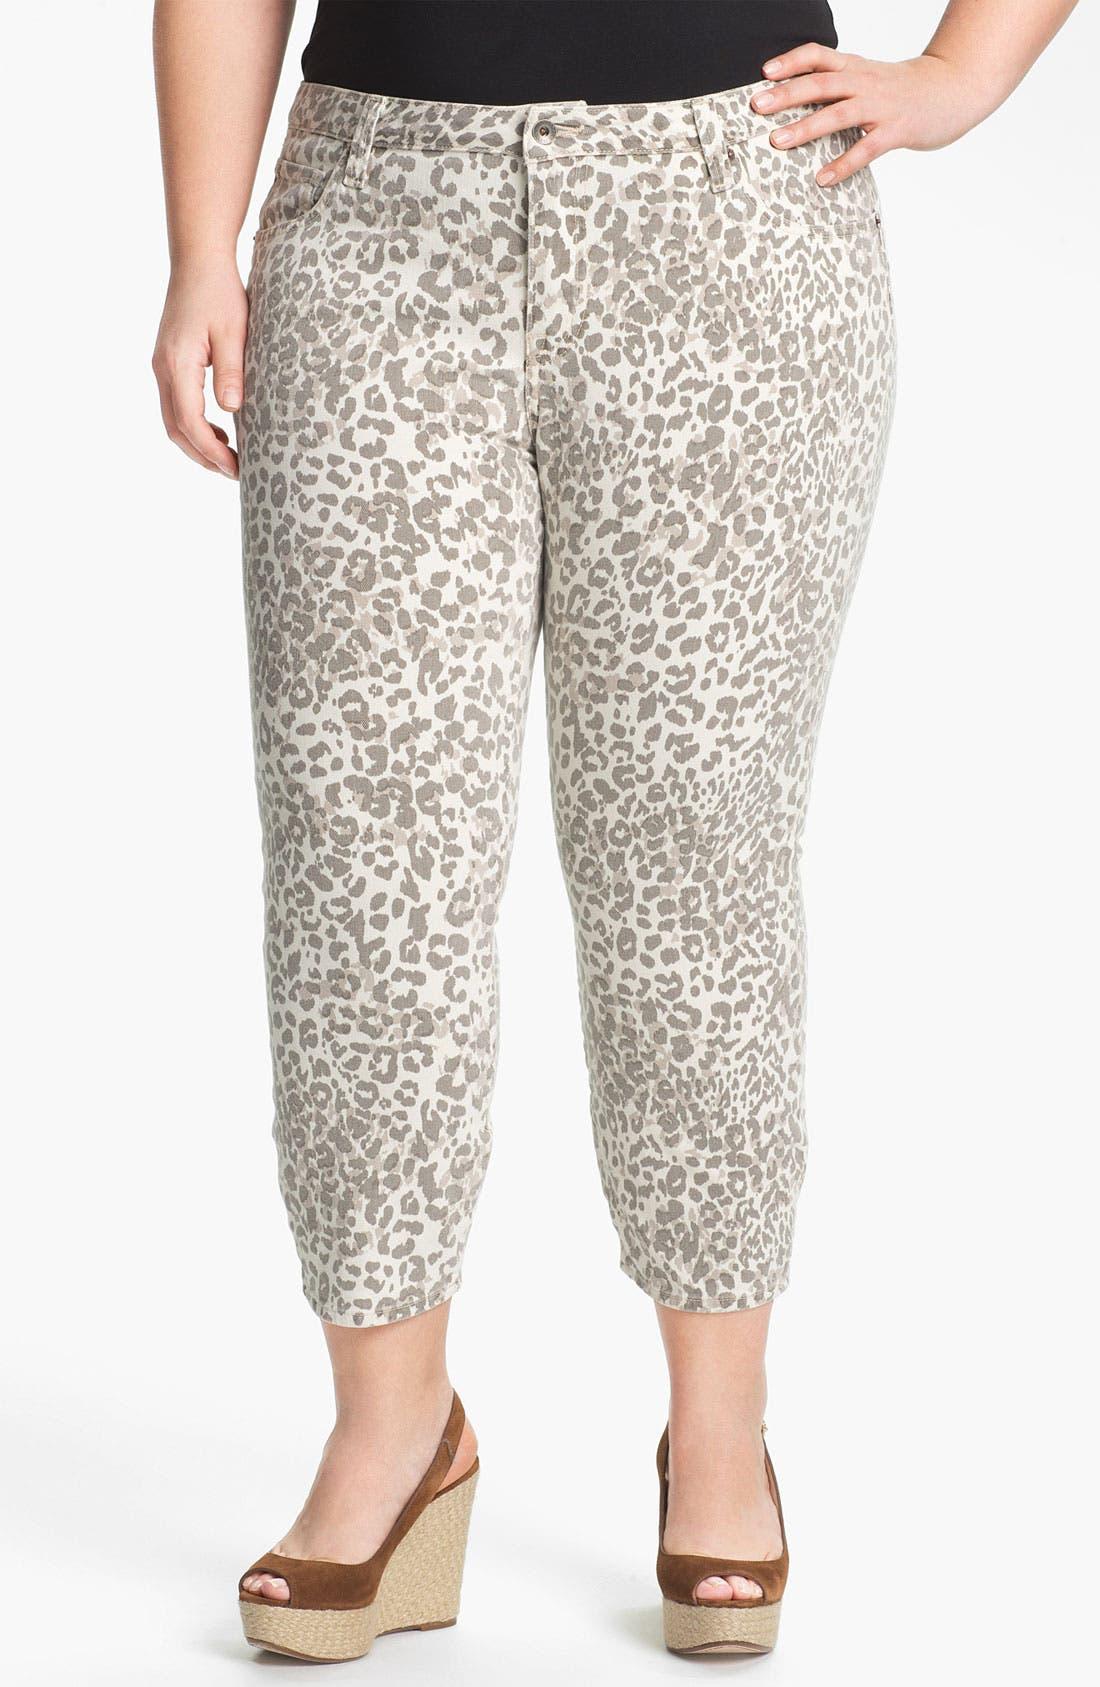 Main Image - Lucky Brand 'Ginger' Print Capri Jeans (Plus Size)